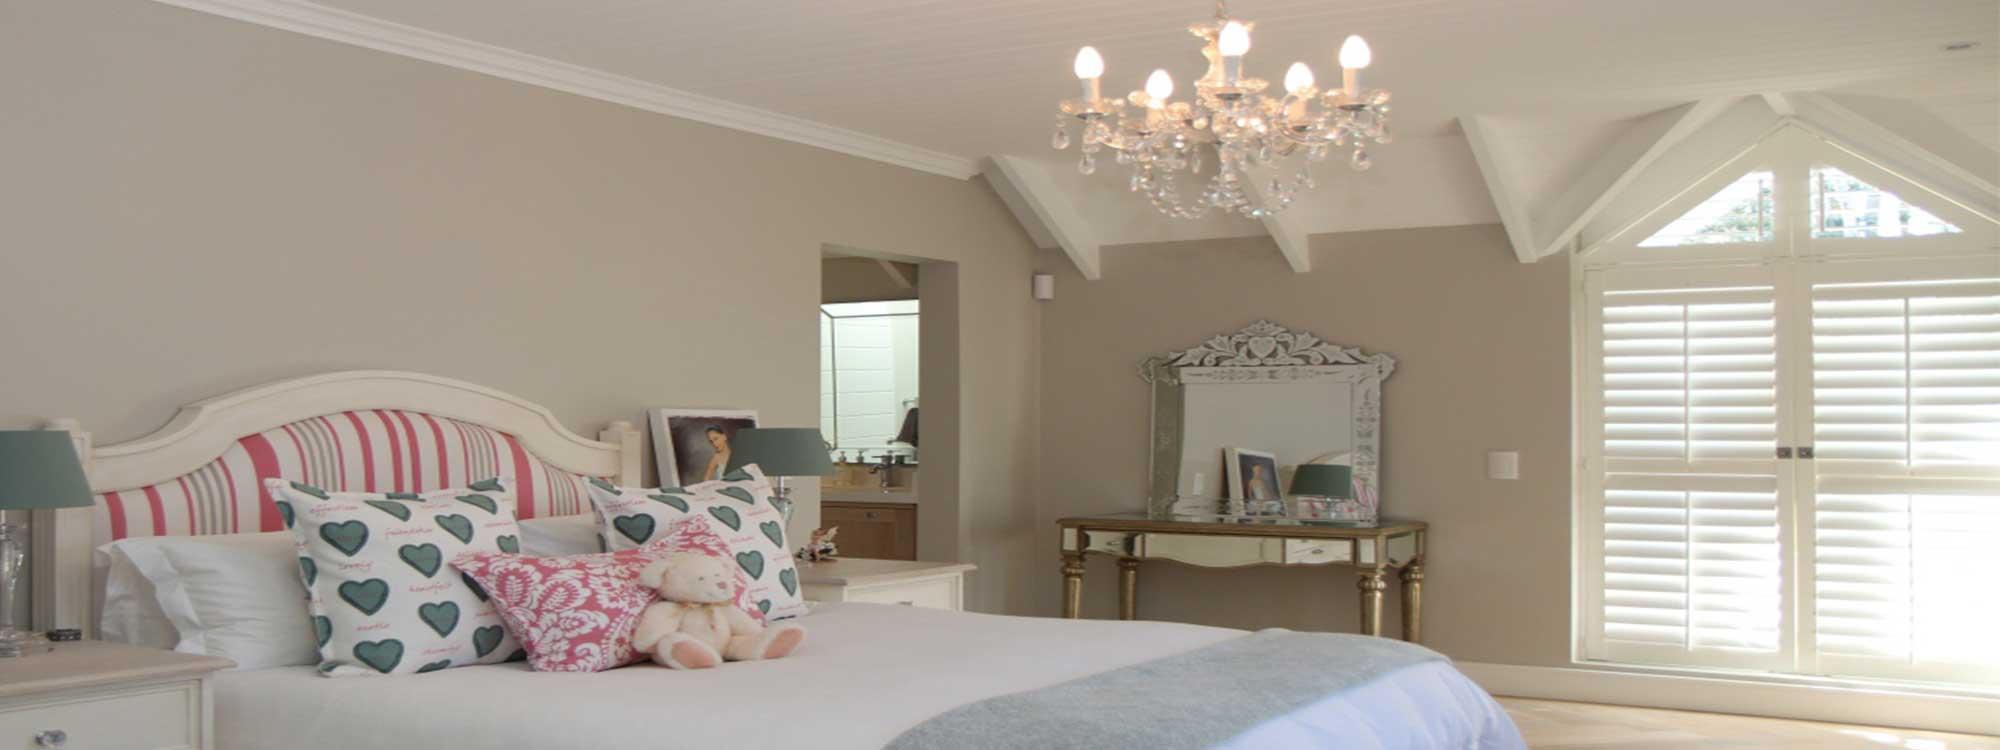 Decowood-shutters-bedroom-custom-shape